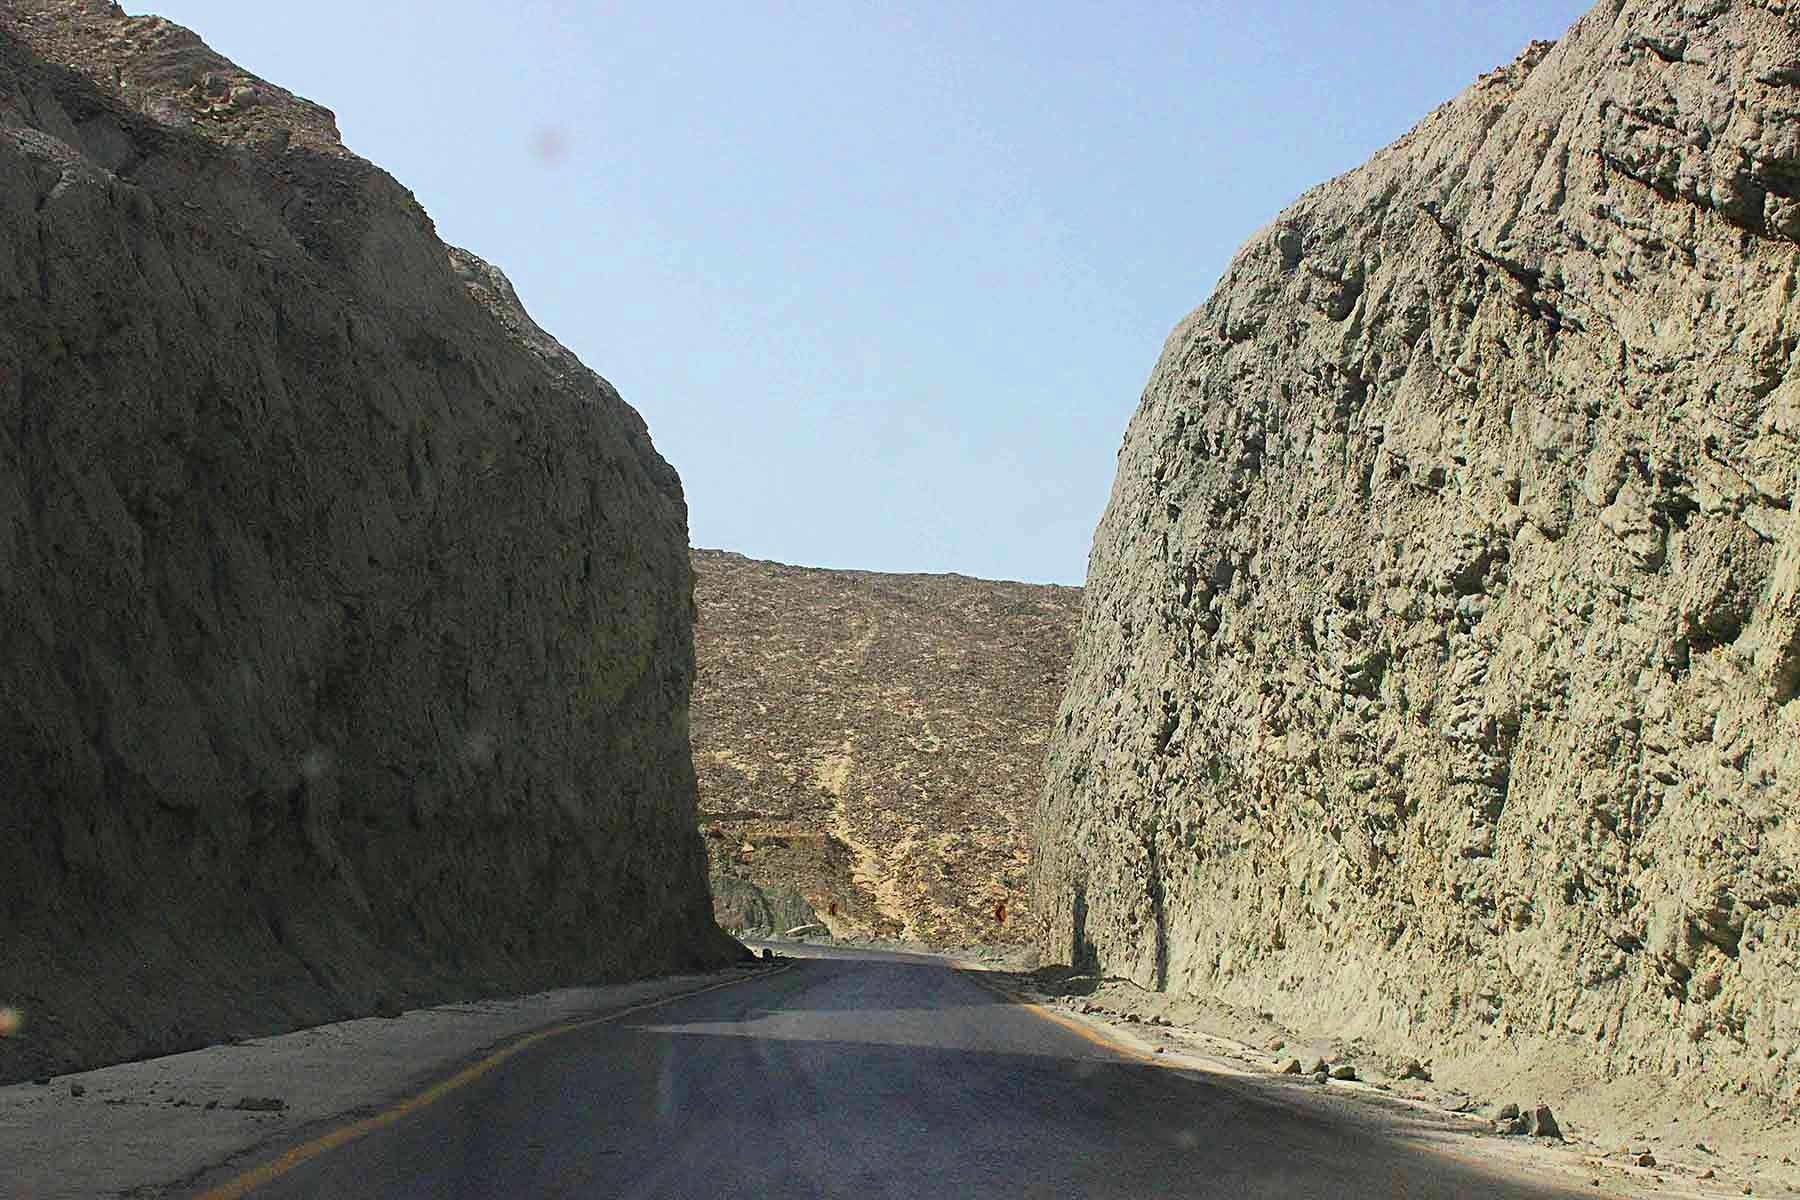 Road built by cutting two huge mountains, reminding me of Kati Pahari in Karachi.